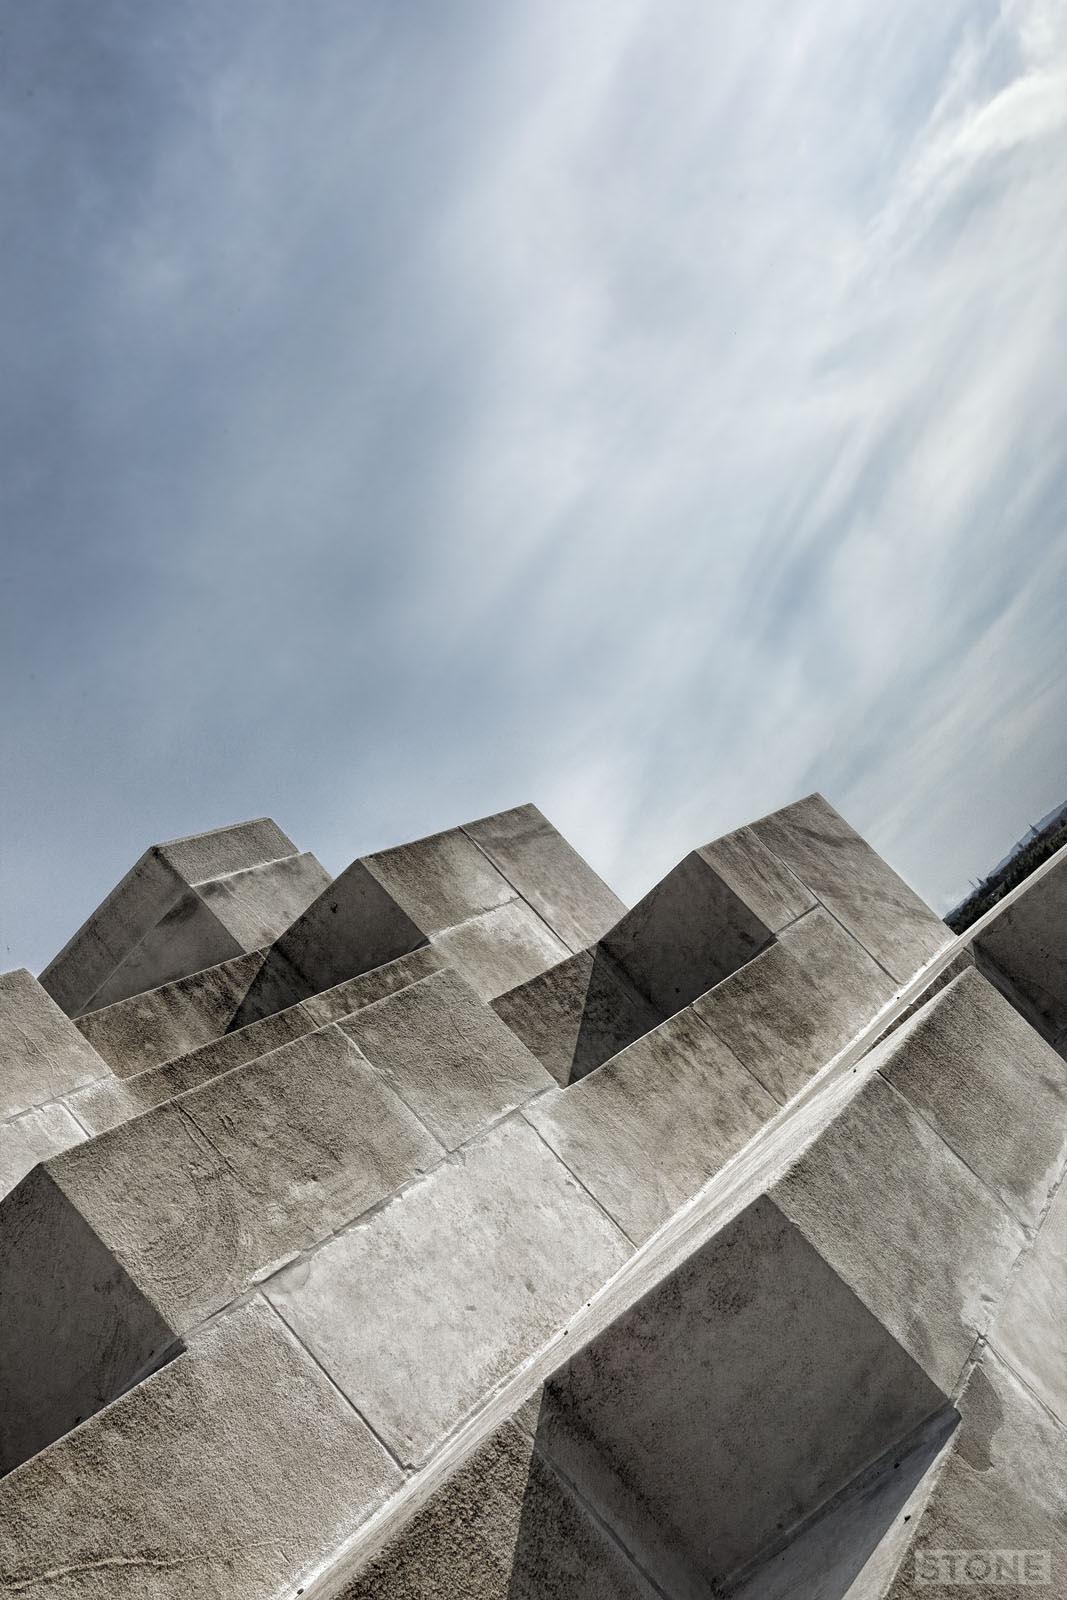 Tyne cot © Nick Stone 7